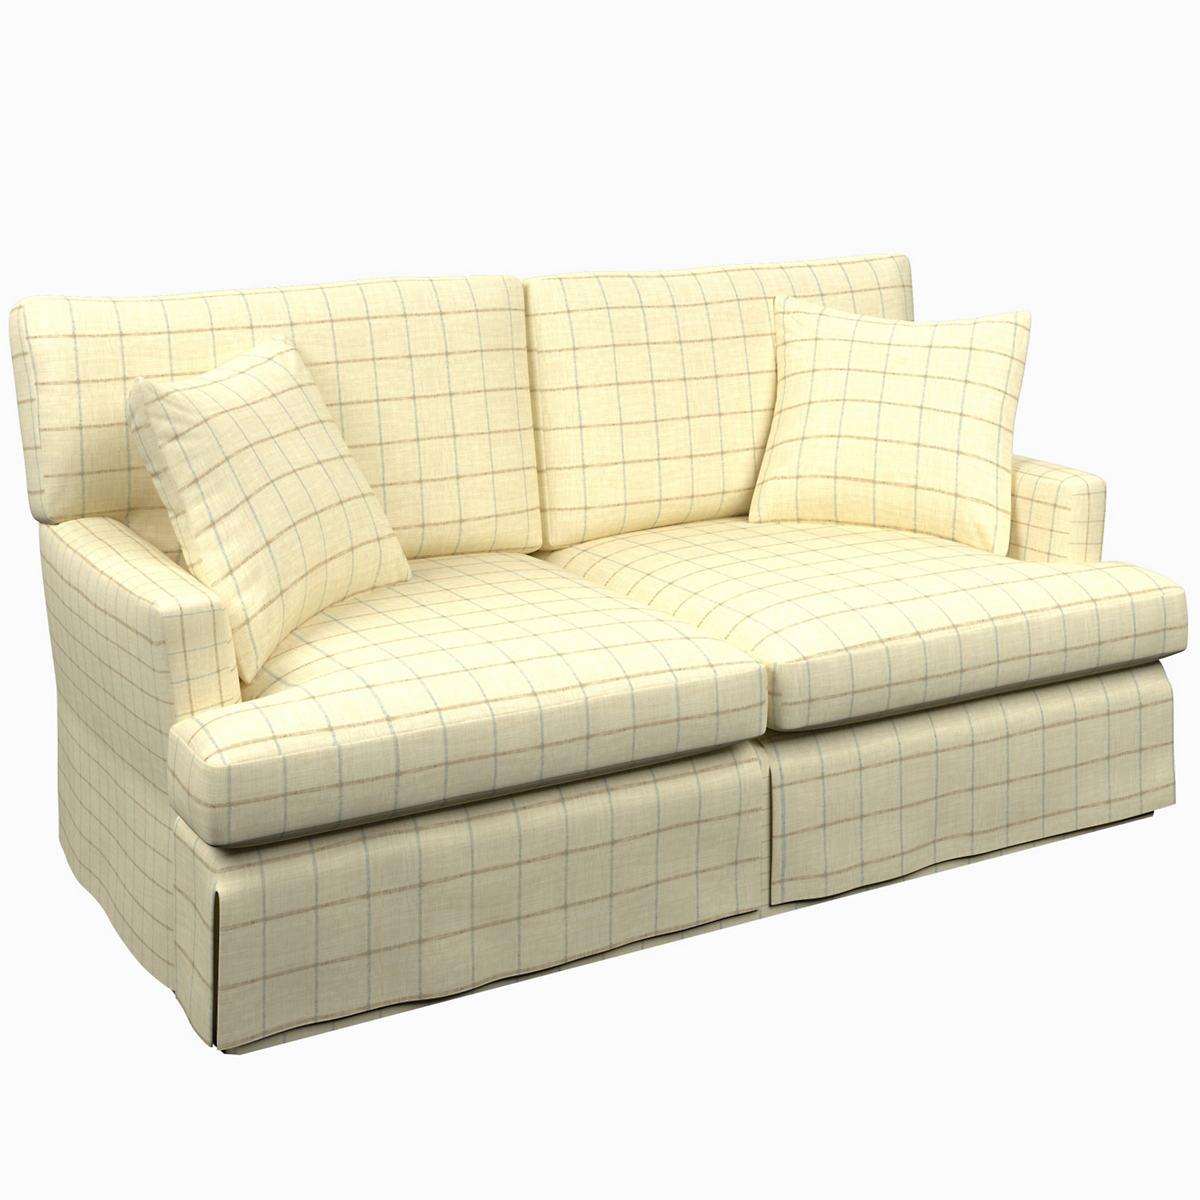 Chatham Tattersall Light Blue/Natural Saybrook 2 Seater Upholstered Sofa